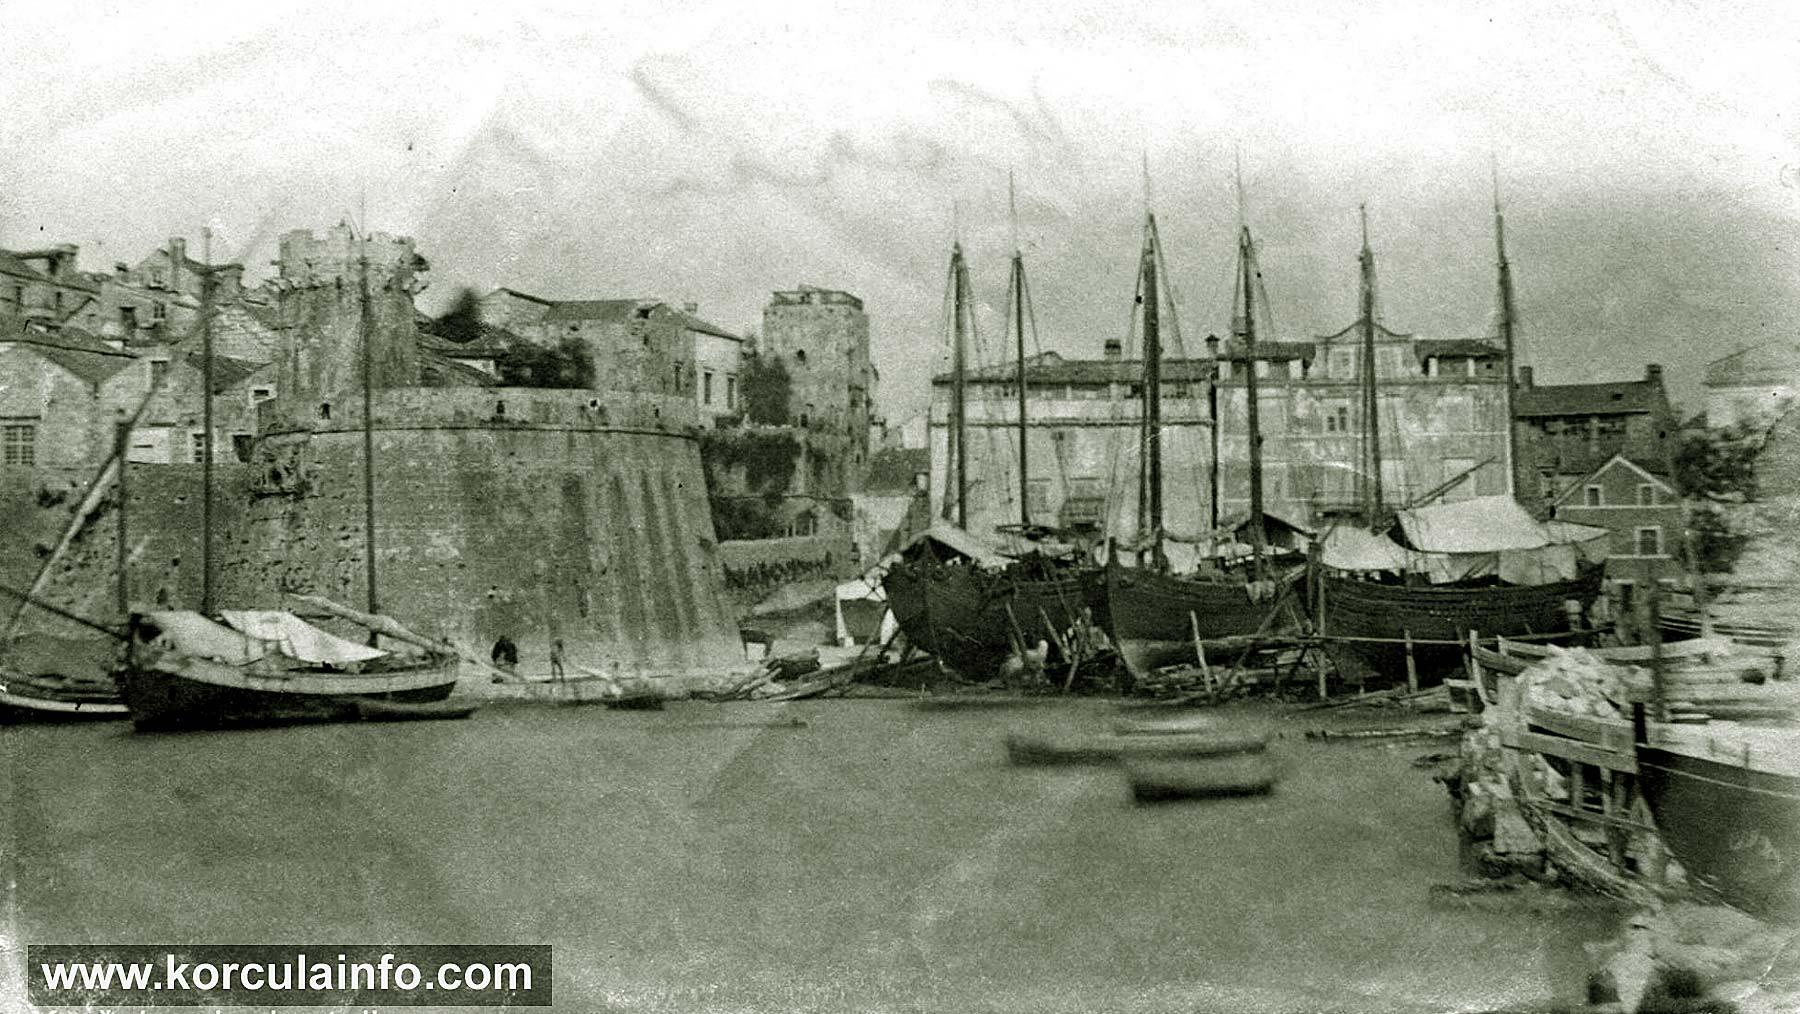 Small shipyard Sessa in Korcula (1900s)